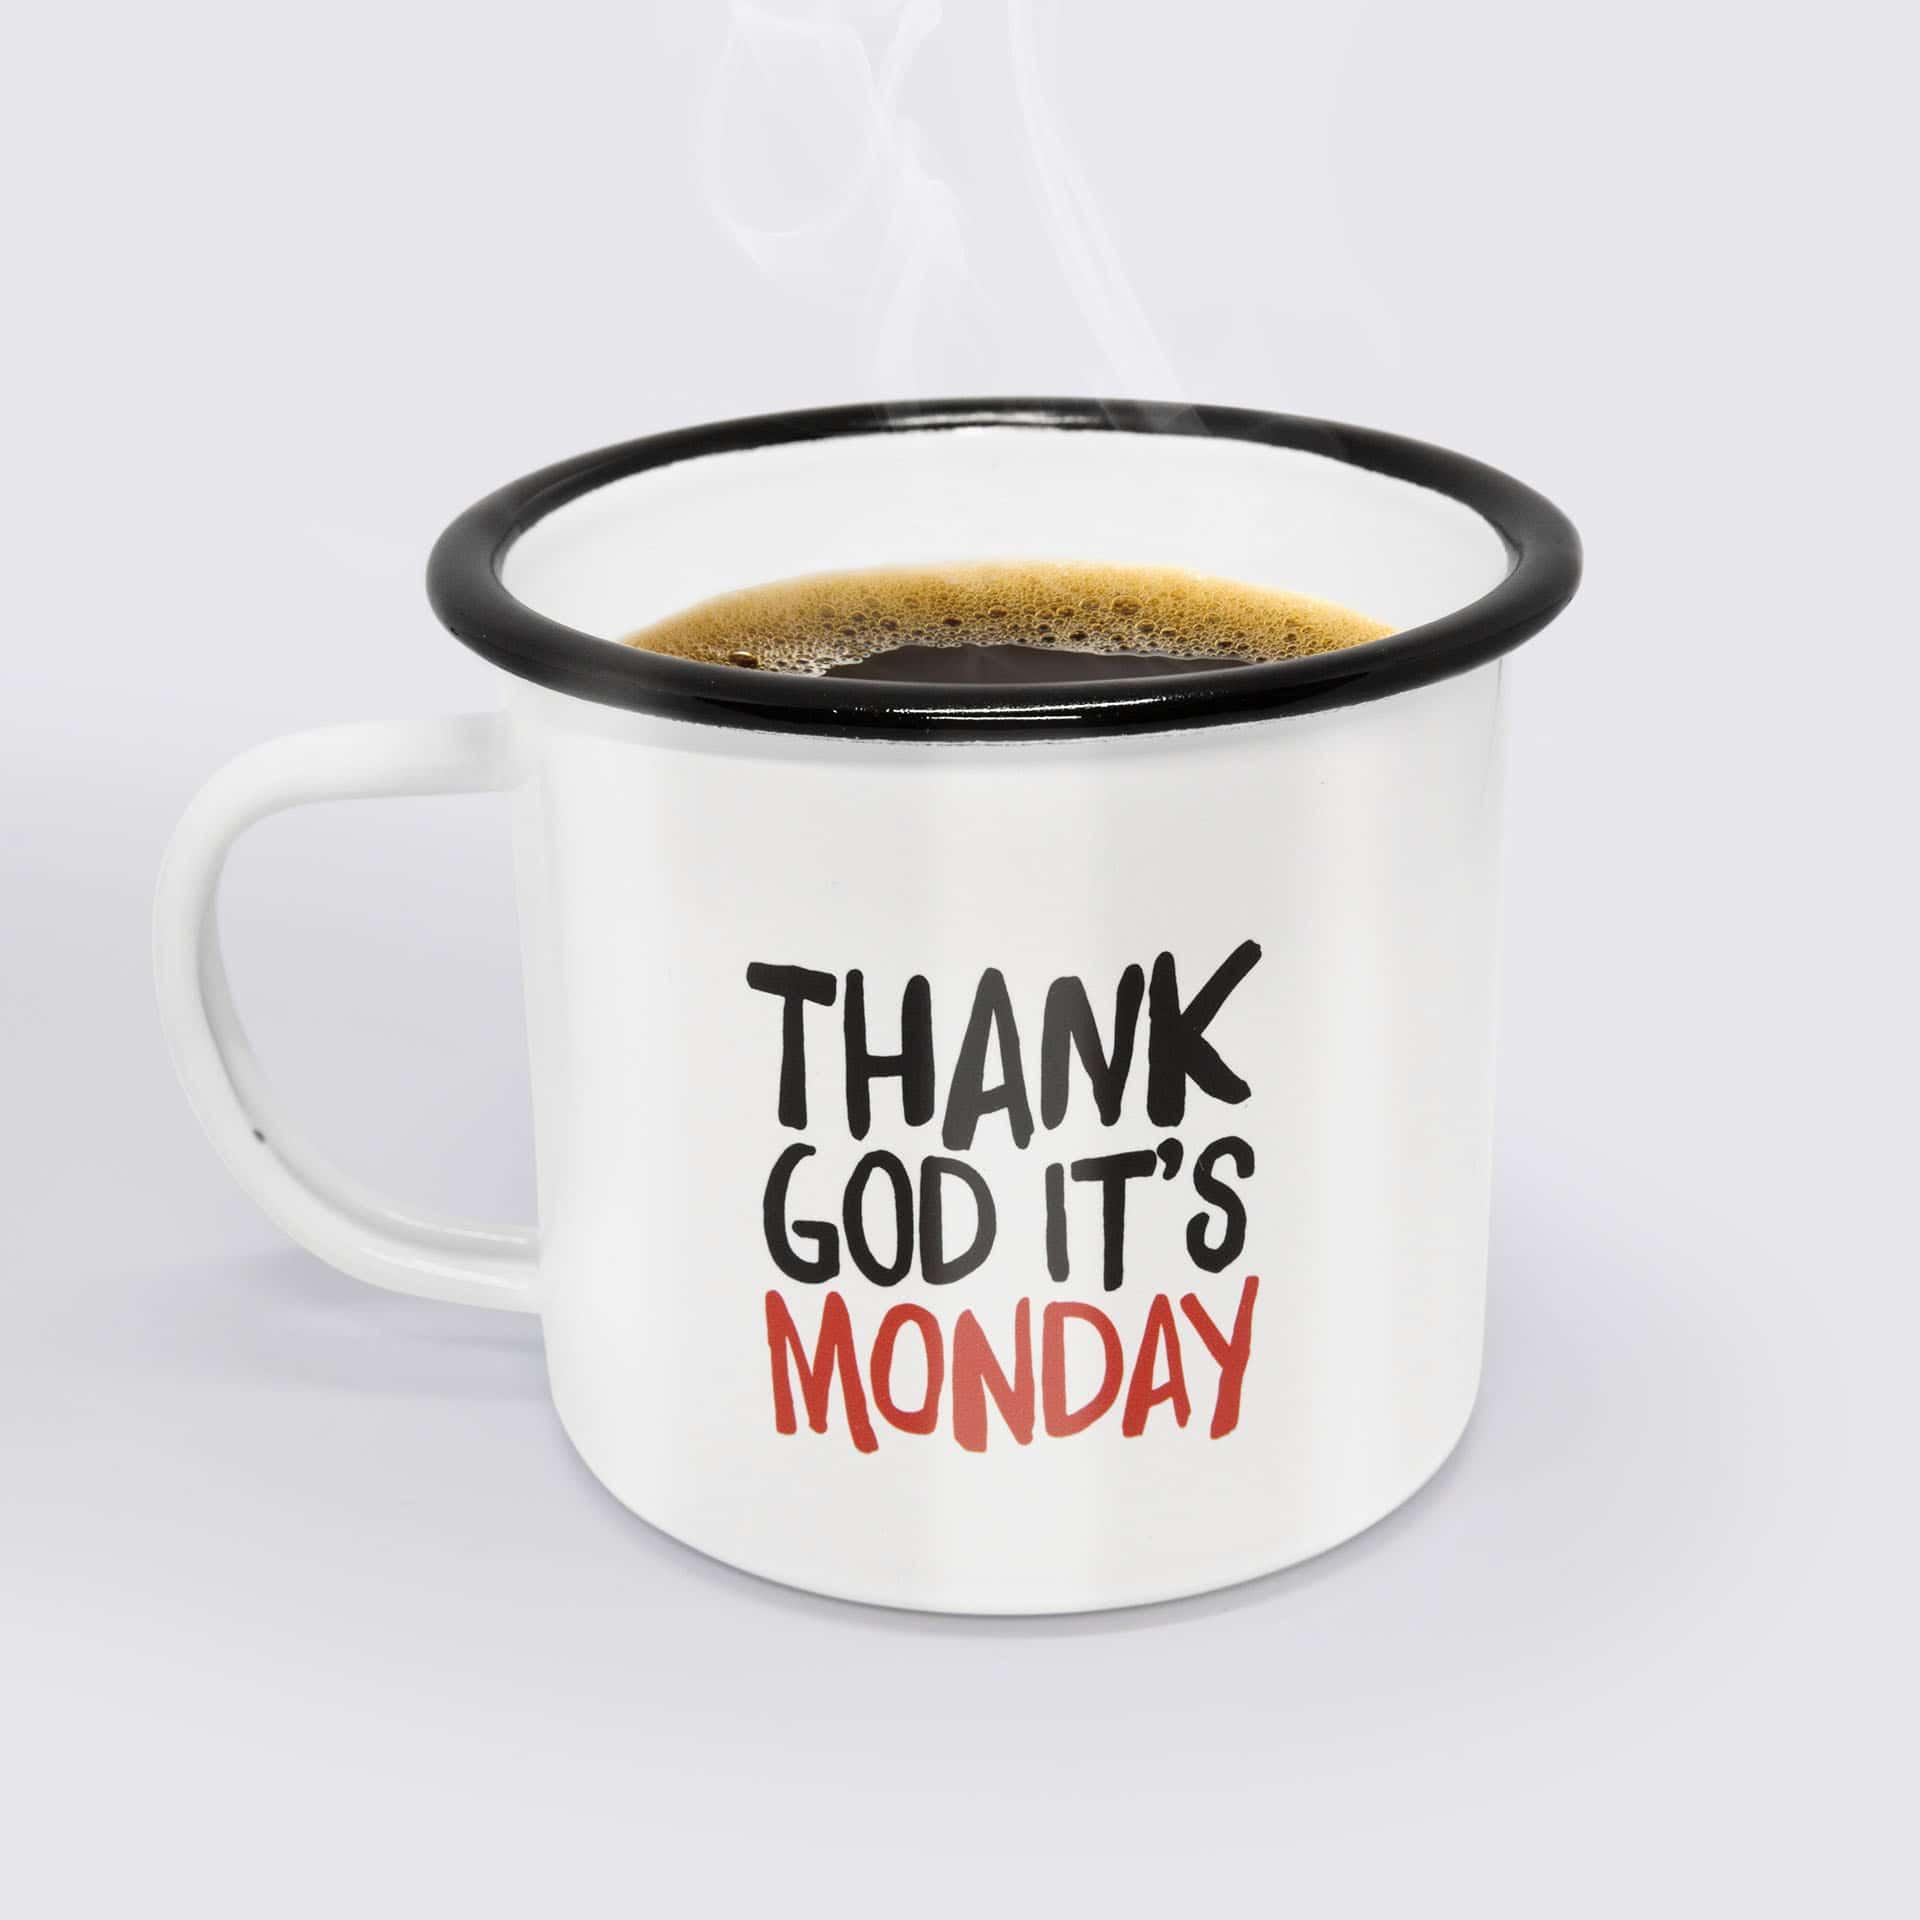 Thank god it's monday – Tasse